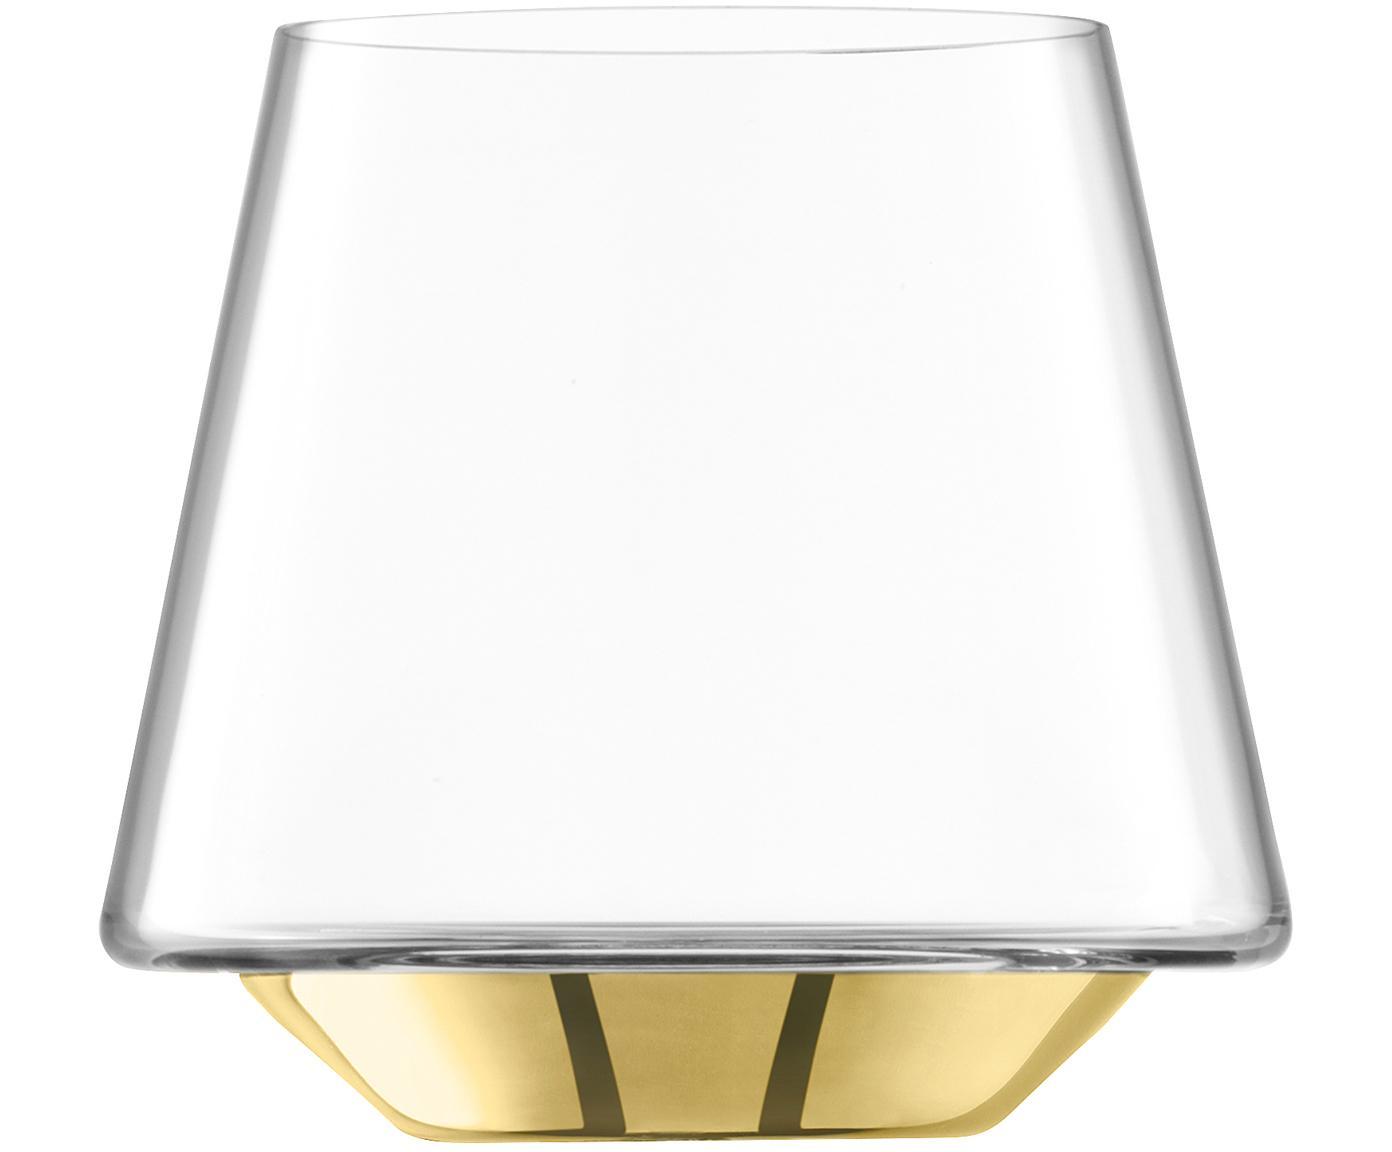 Mundgeblasene Wassergläser Space mit goldenem Boden, 2er-Set, Glas, Transparent, Goldfarben, Ø 10 x H 9 cm